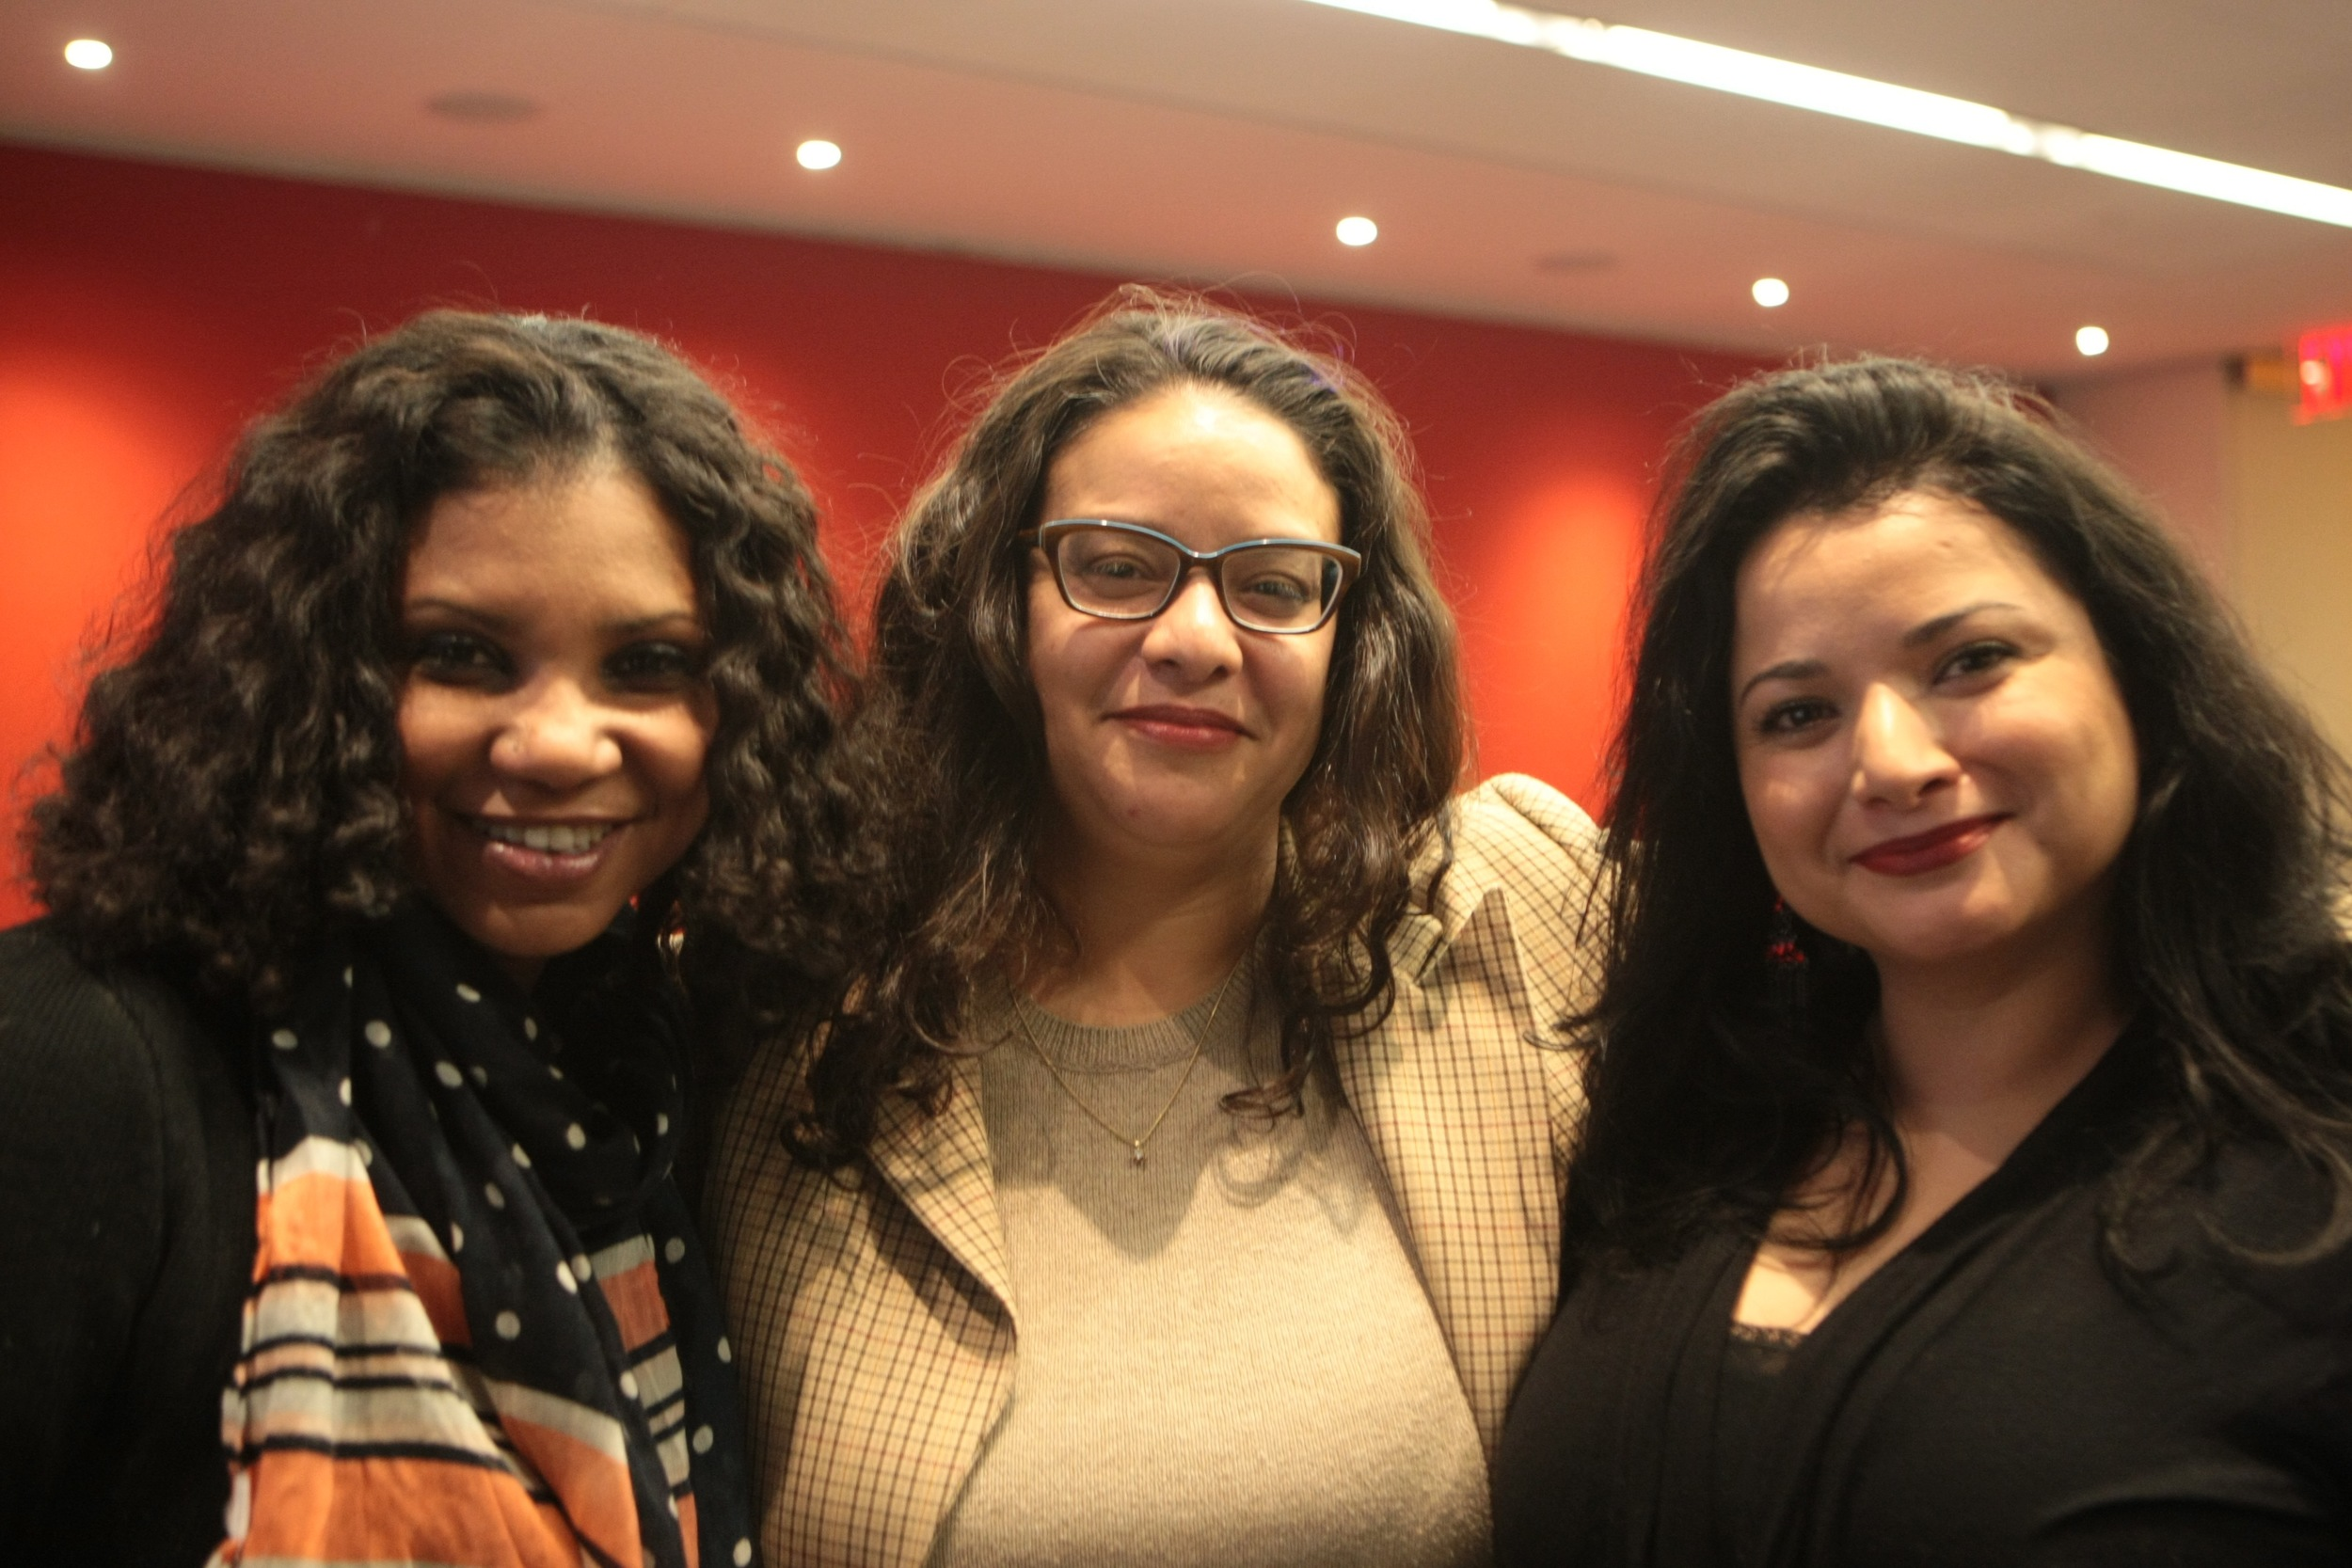 Nelly Rosario, Sheila Maldonado and Macarena Hernández